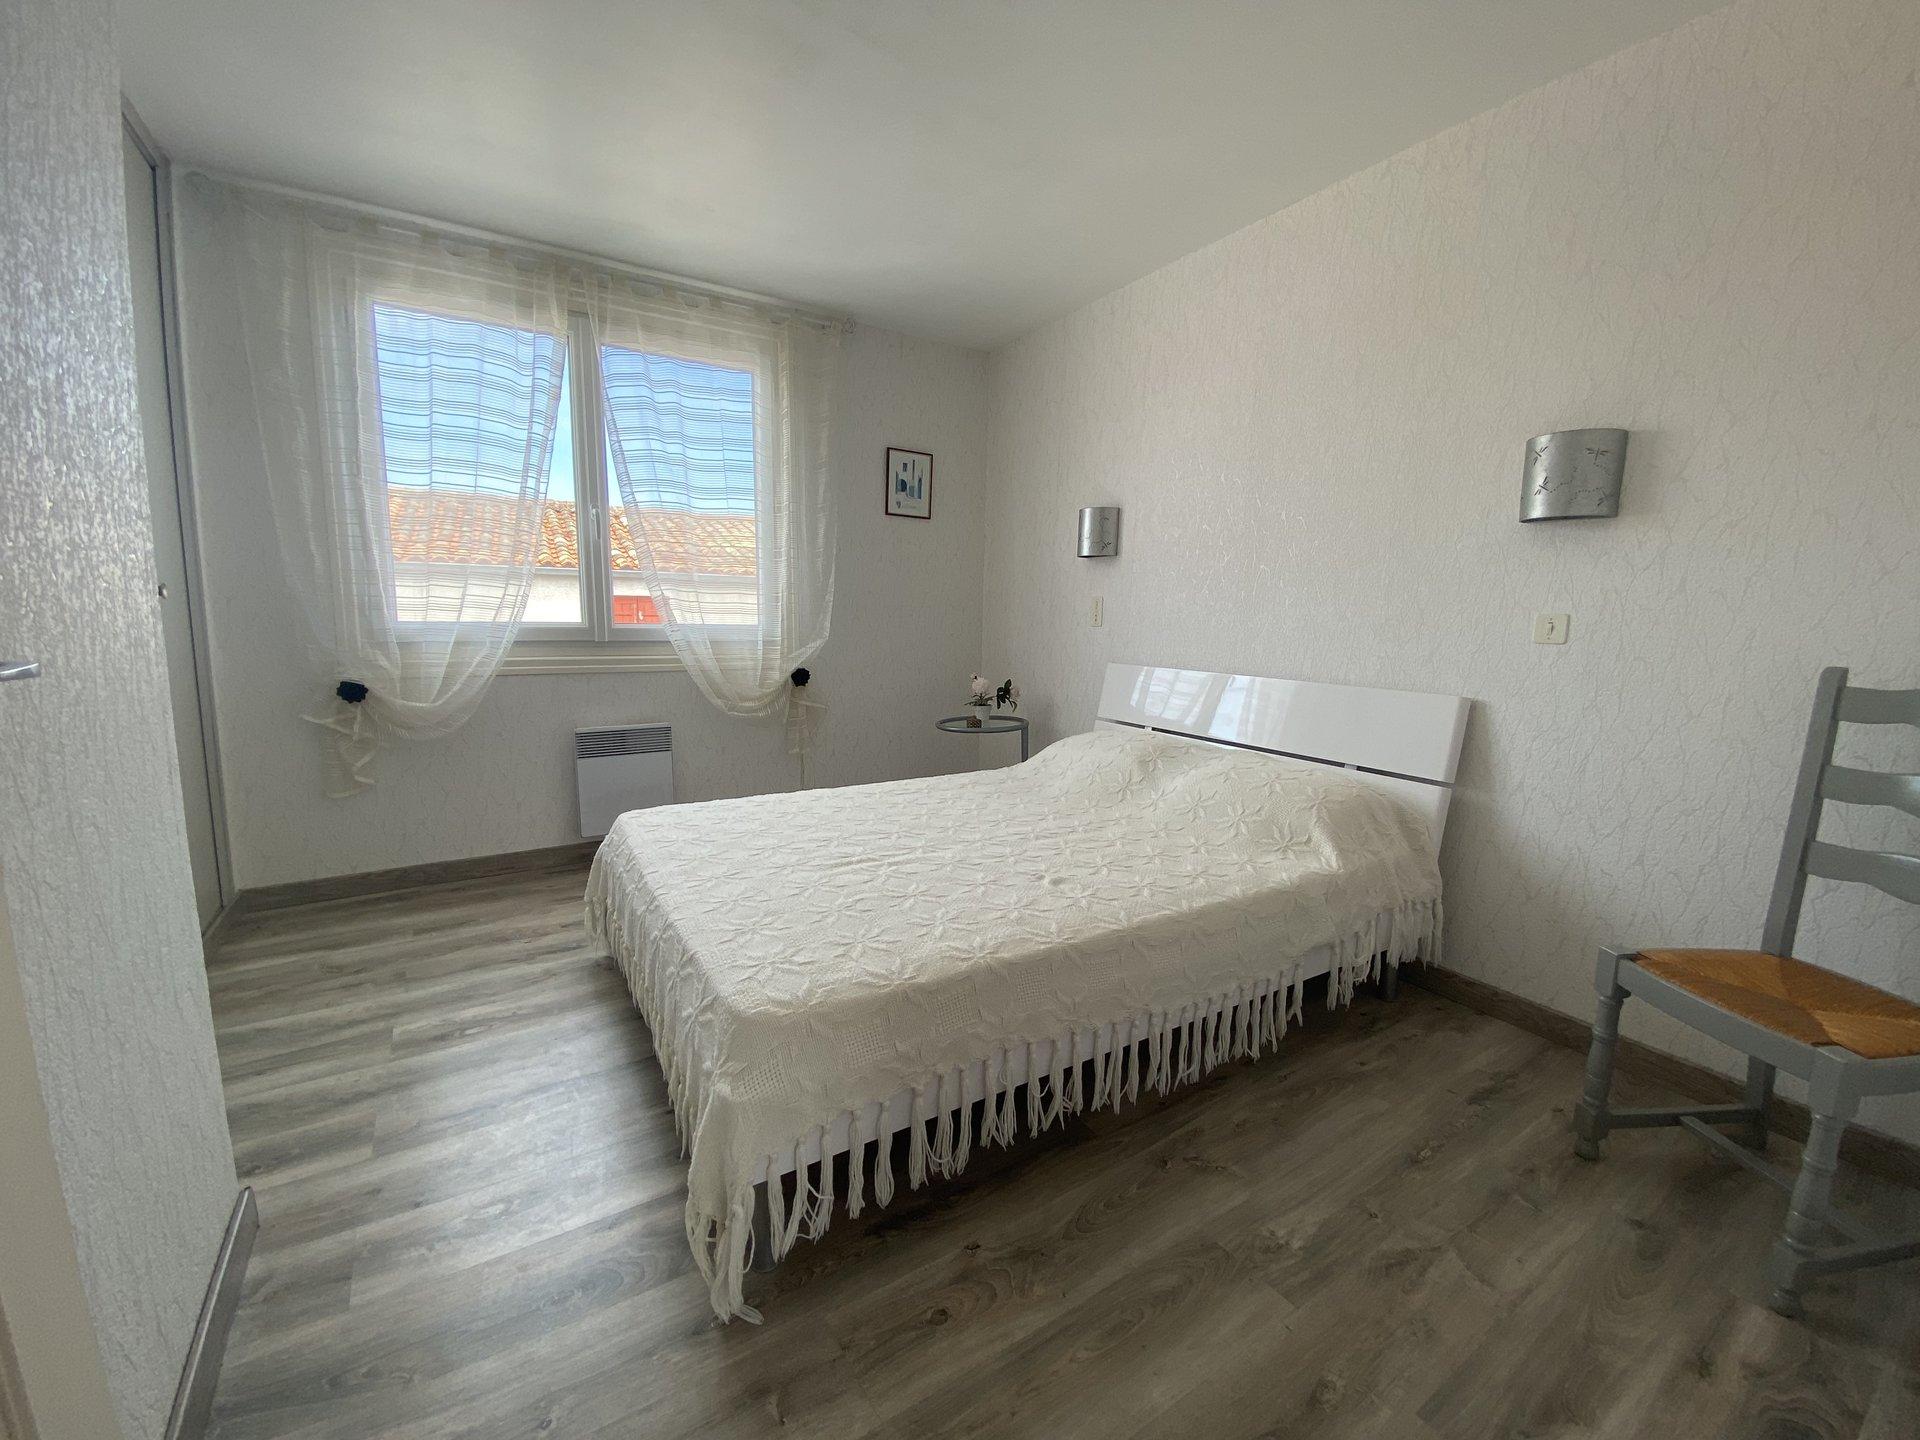 Appartement / Double garage - ILE D'OLERON